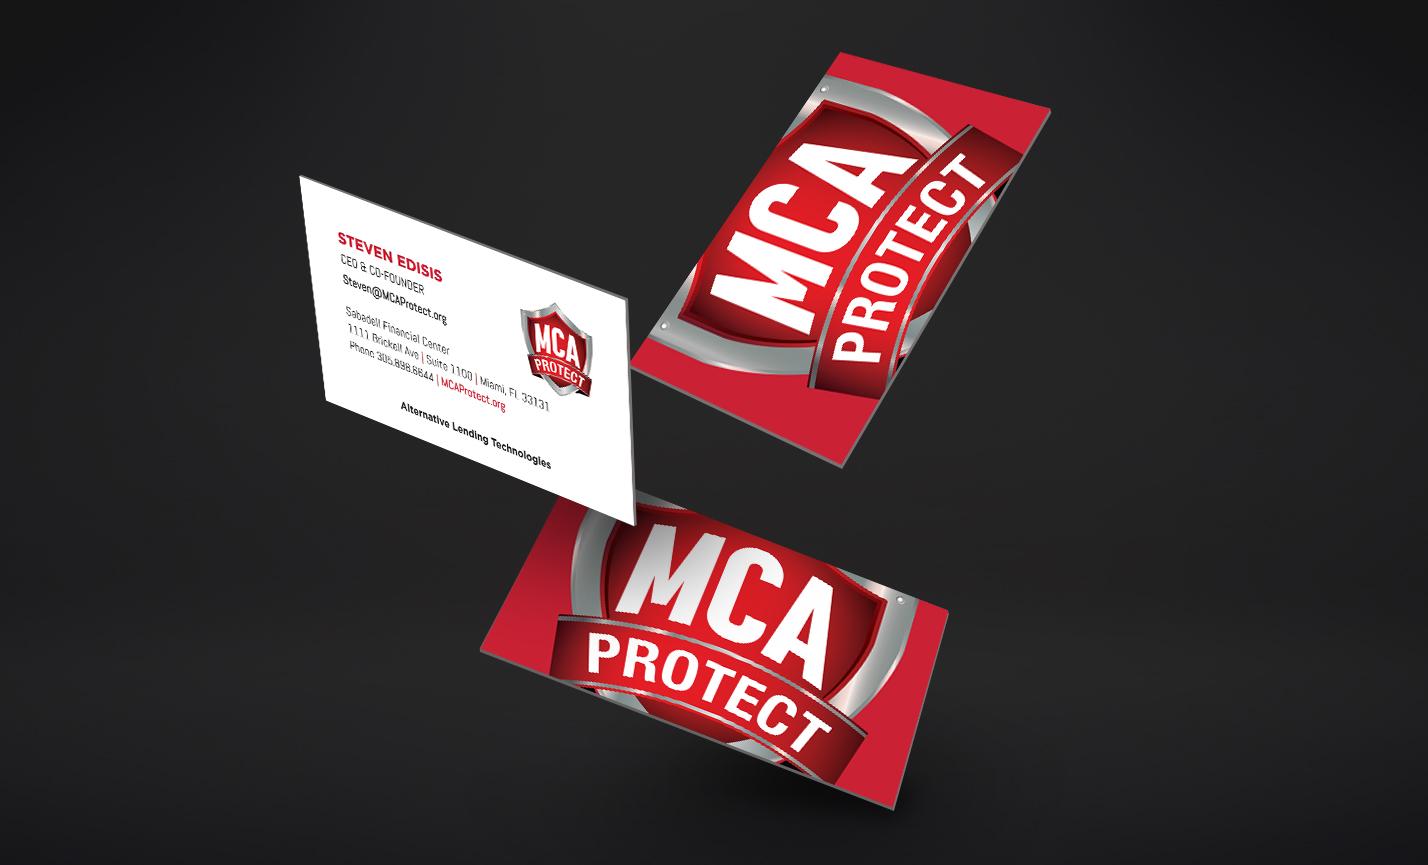 MCA Protect